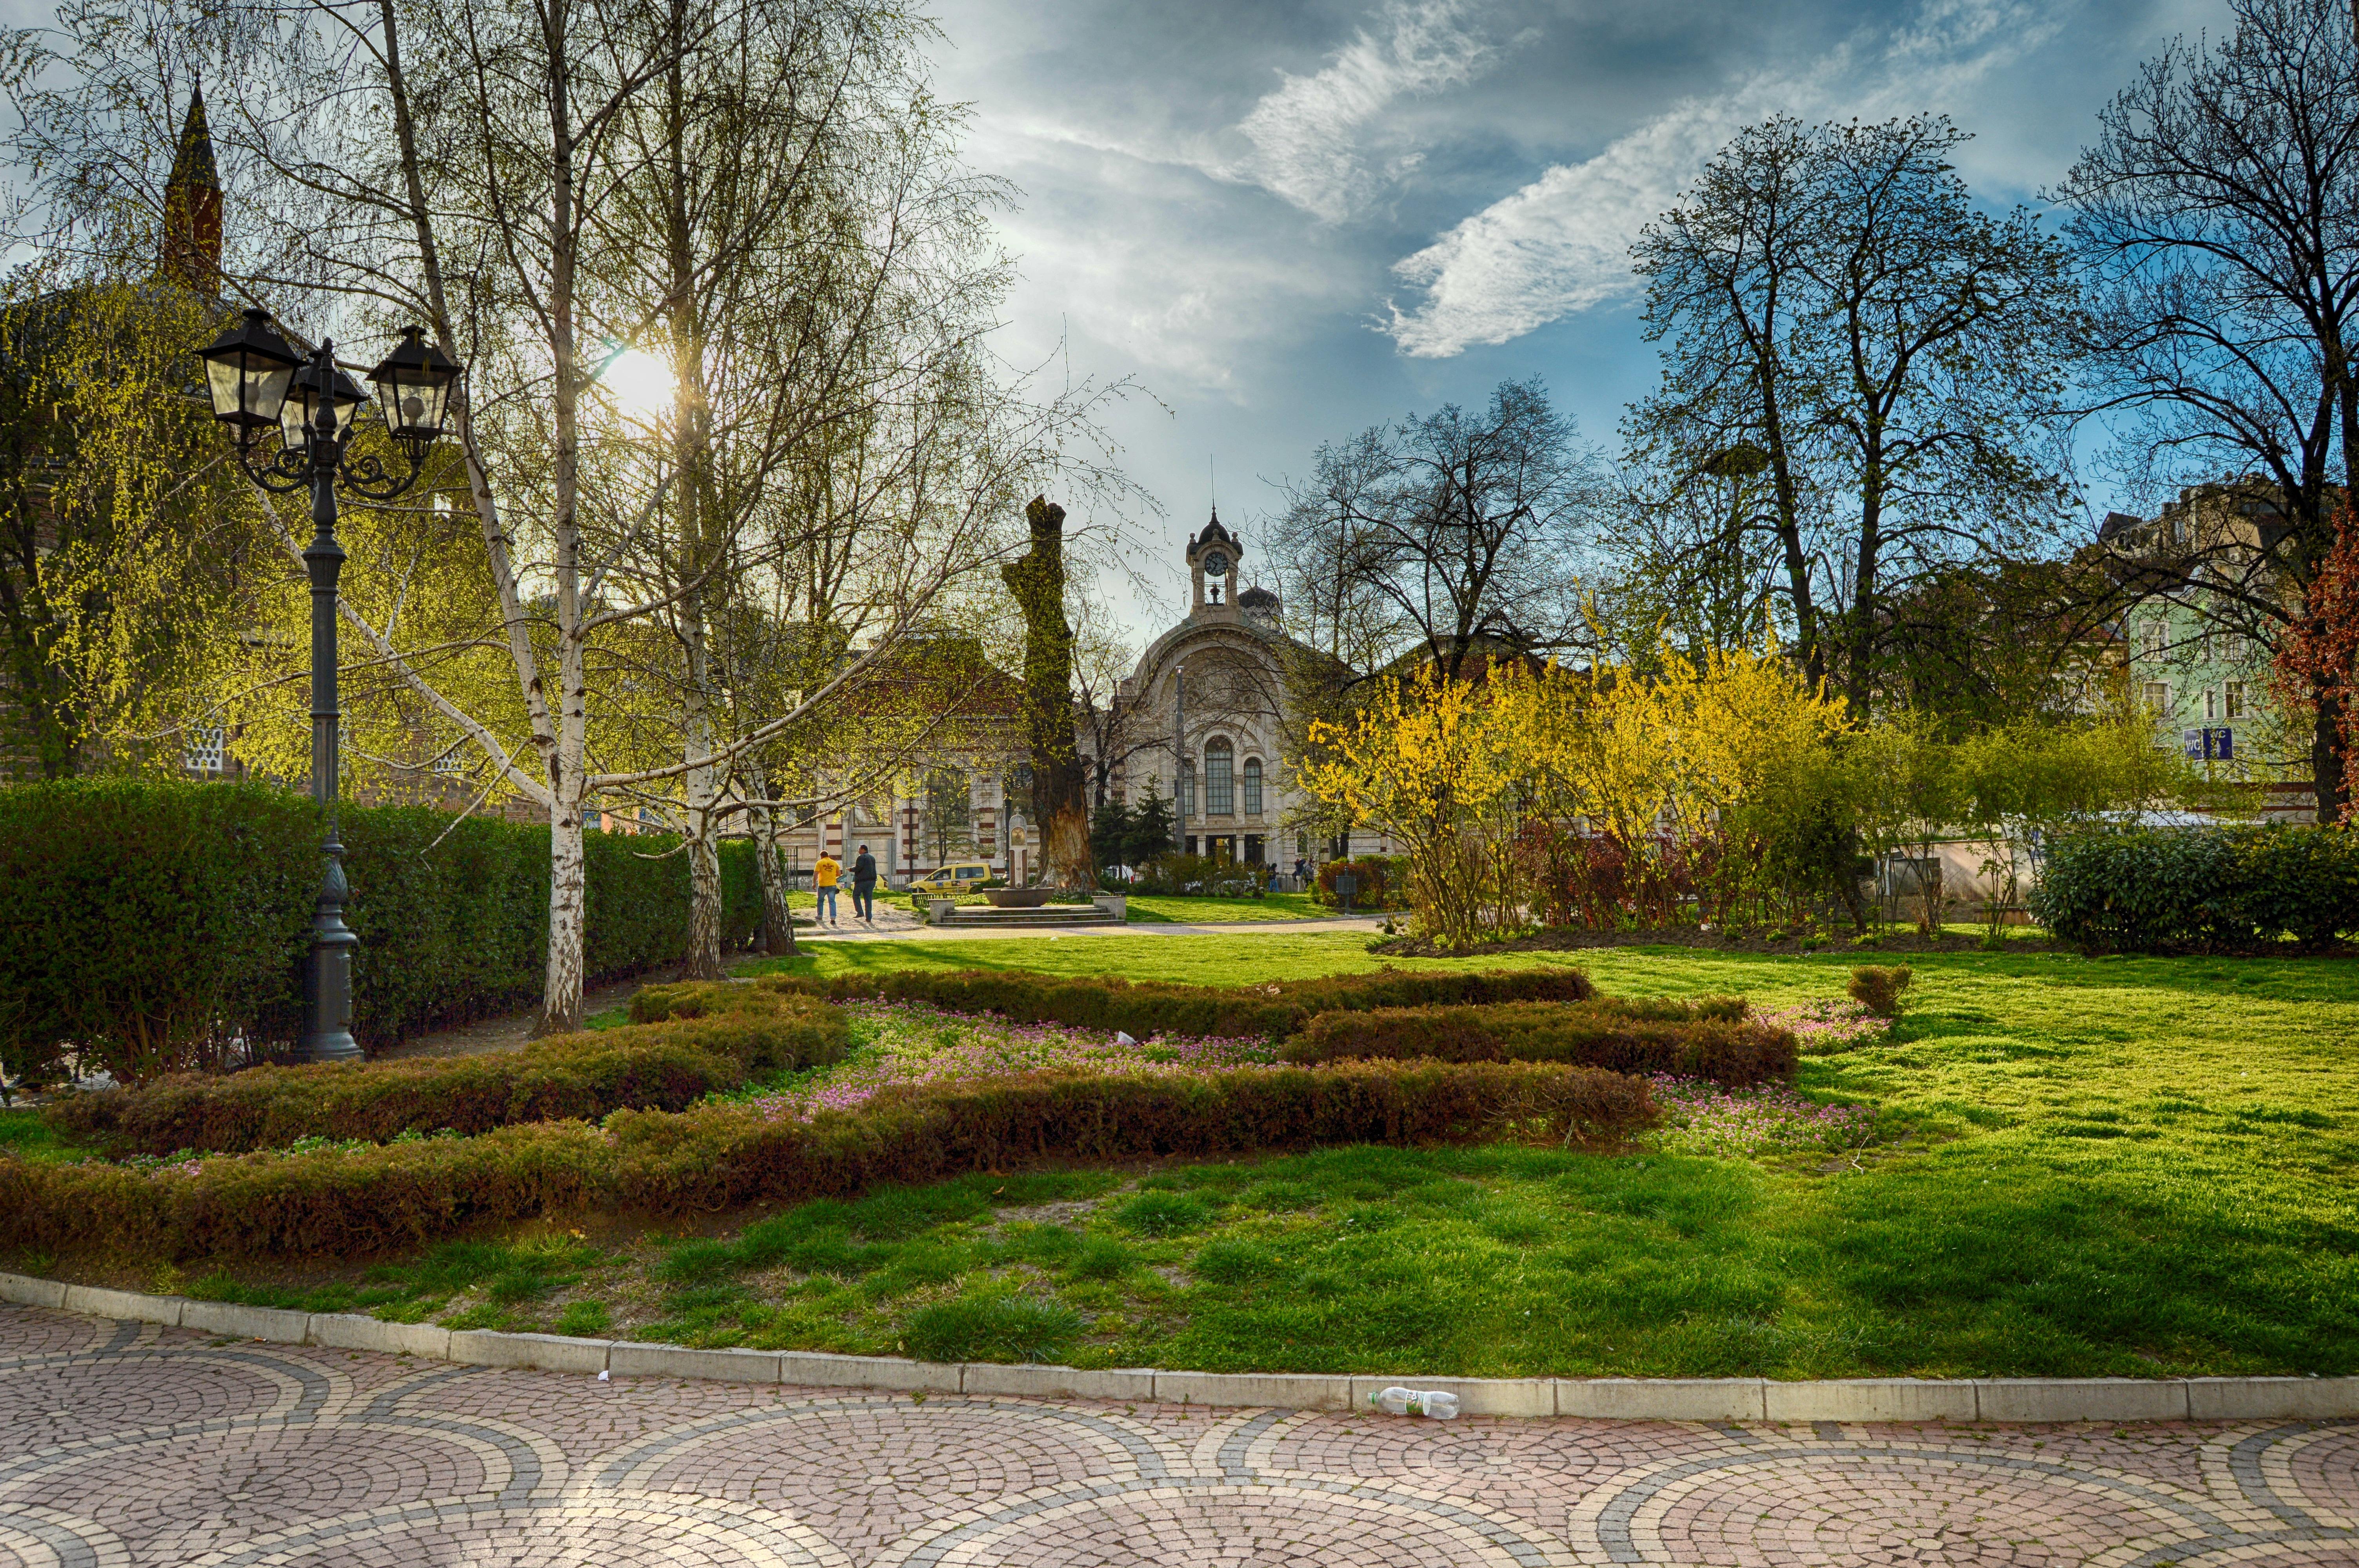 Landschaft Baum Gras Rasen Villa Chateau Herbst Park Hinterhof Garten  Immobilien Garten Bulgarien Sofia Ländliches Gebiet